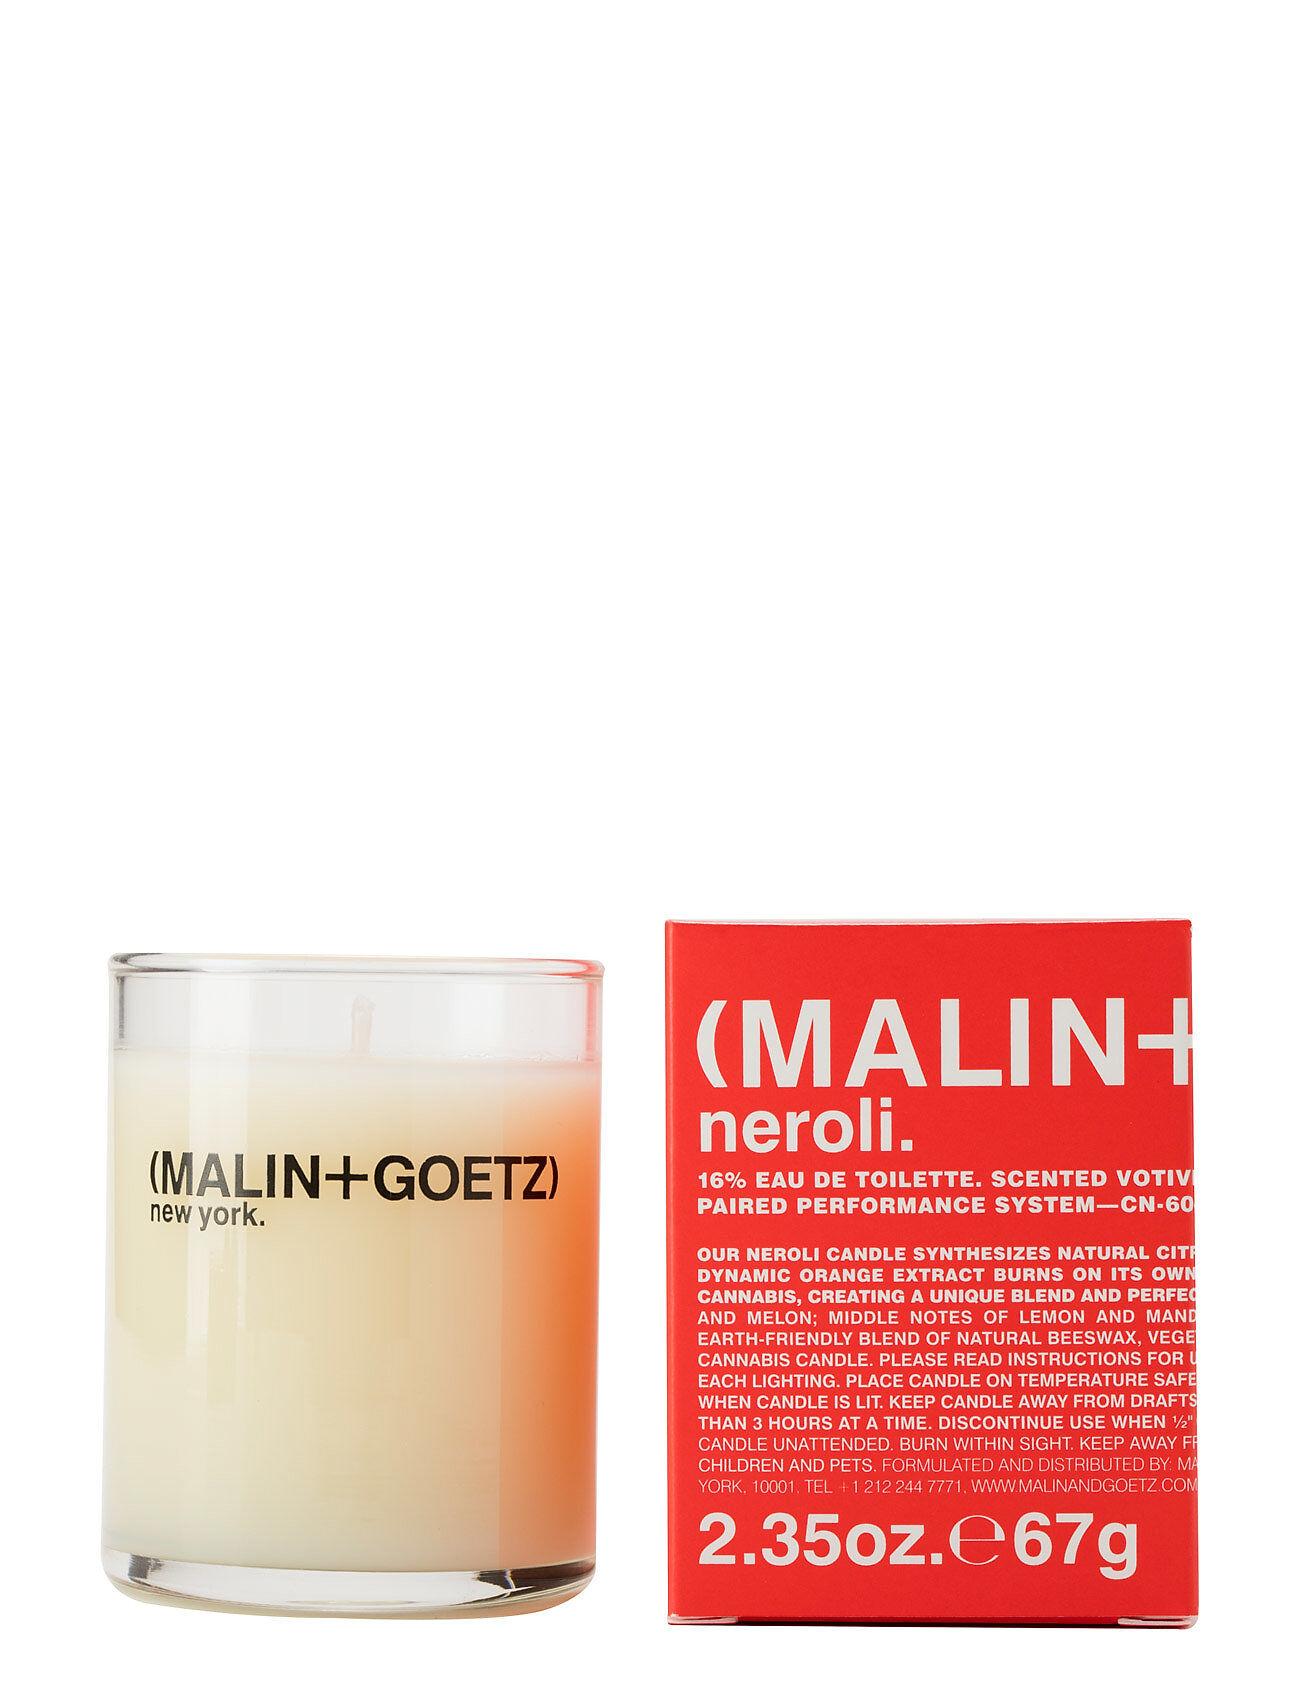 MALIN+GOETZ Neroli Votive Candle Hajuvesi Parfyymi Nude MALIN+GOETZ